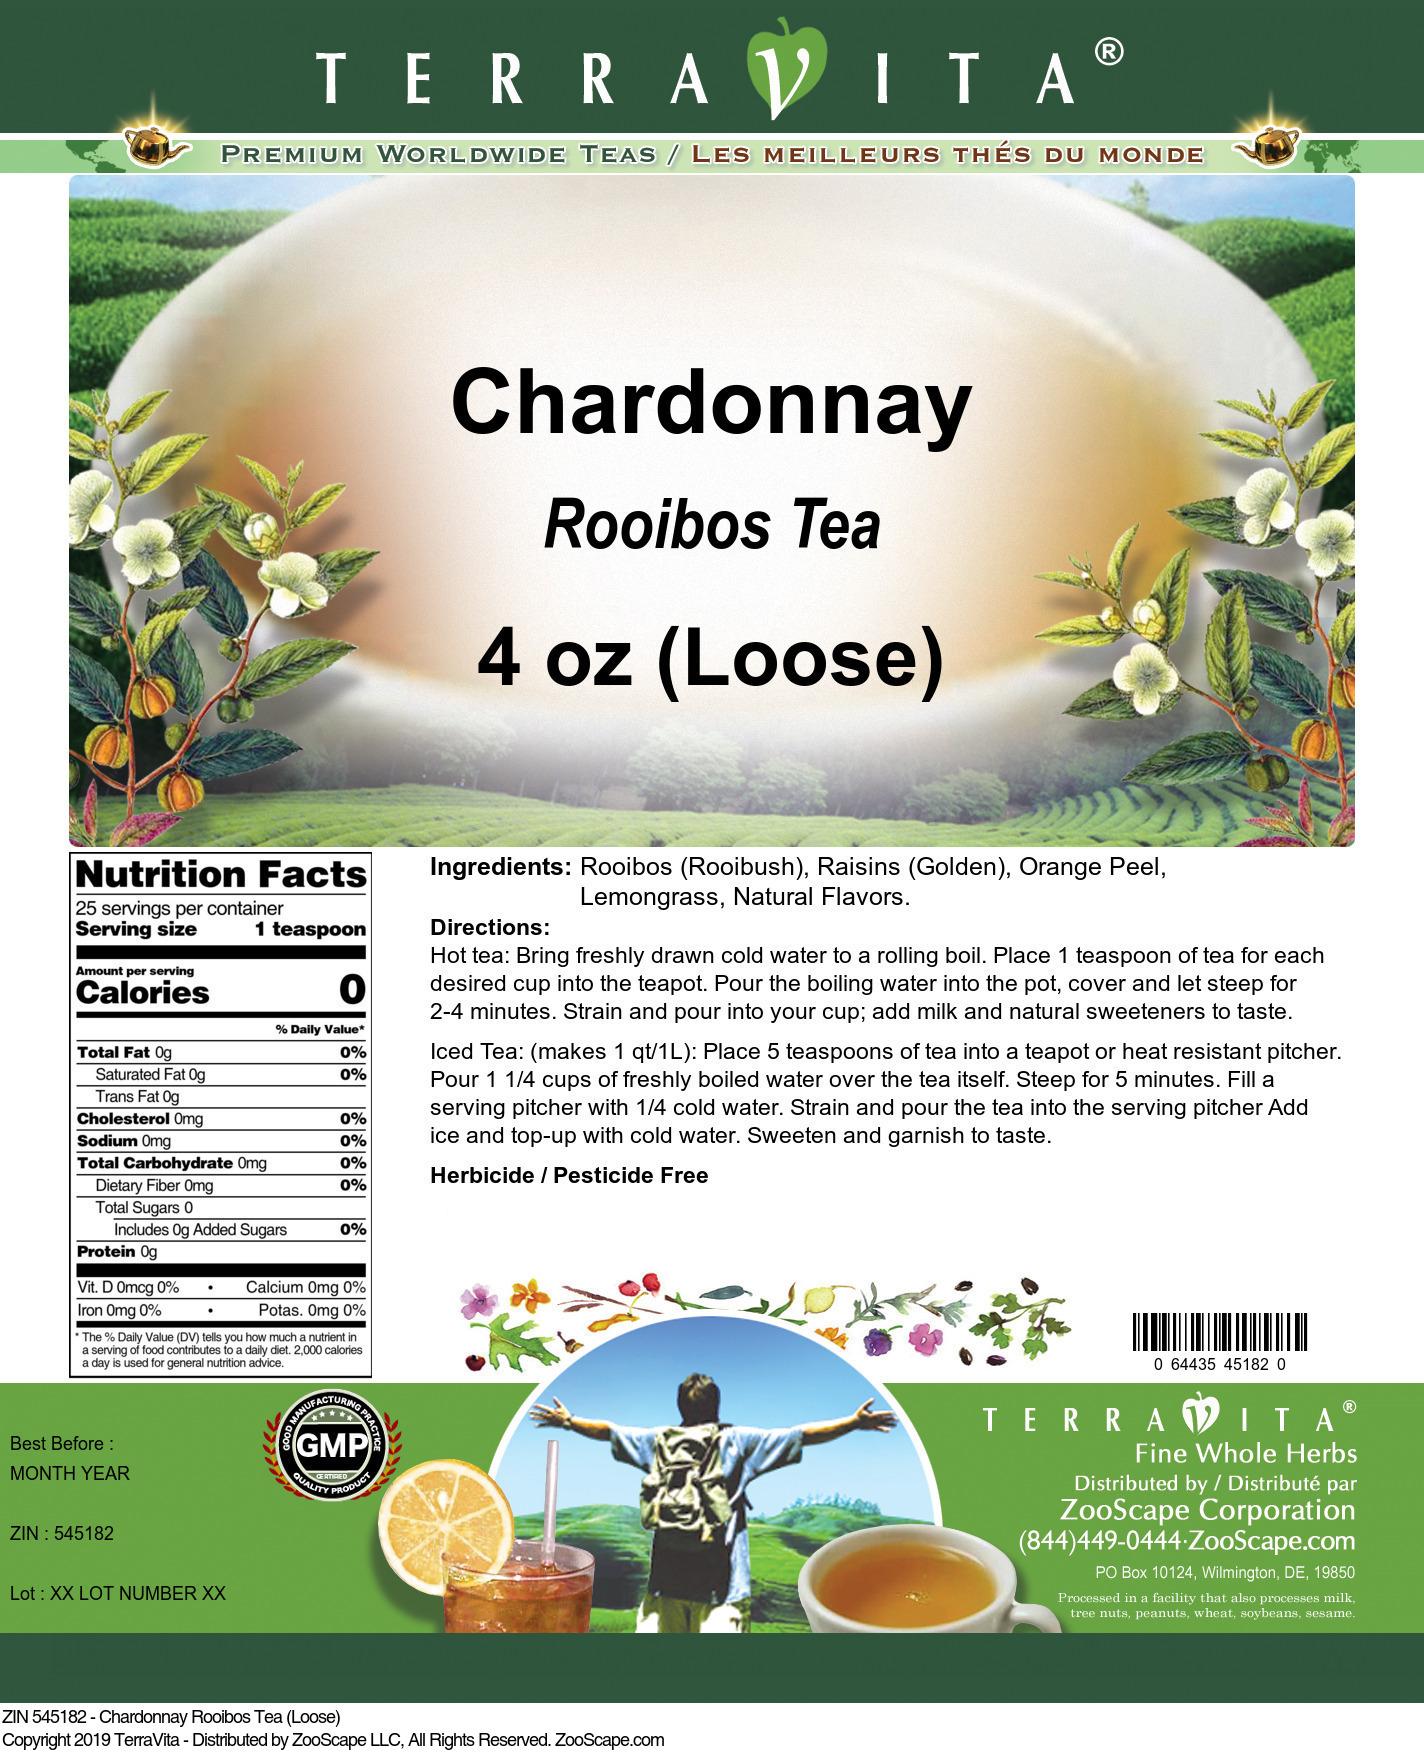 Chardonnay Rooibos Tea (Loose)